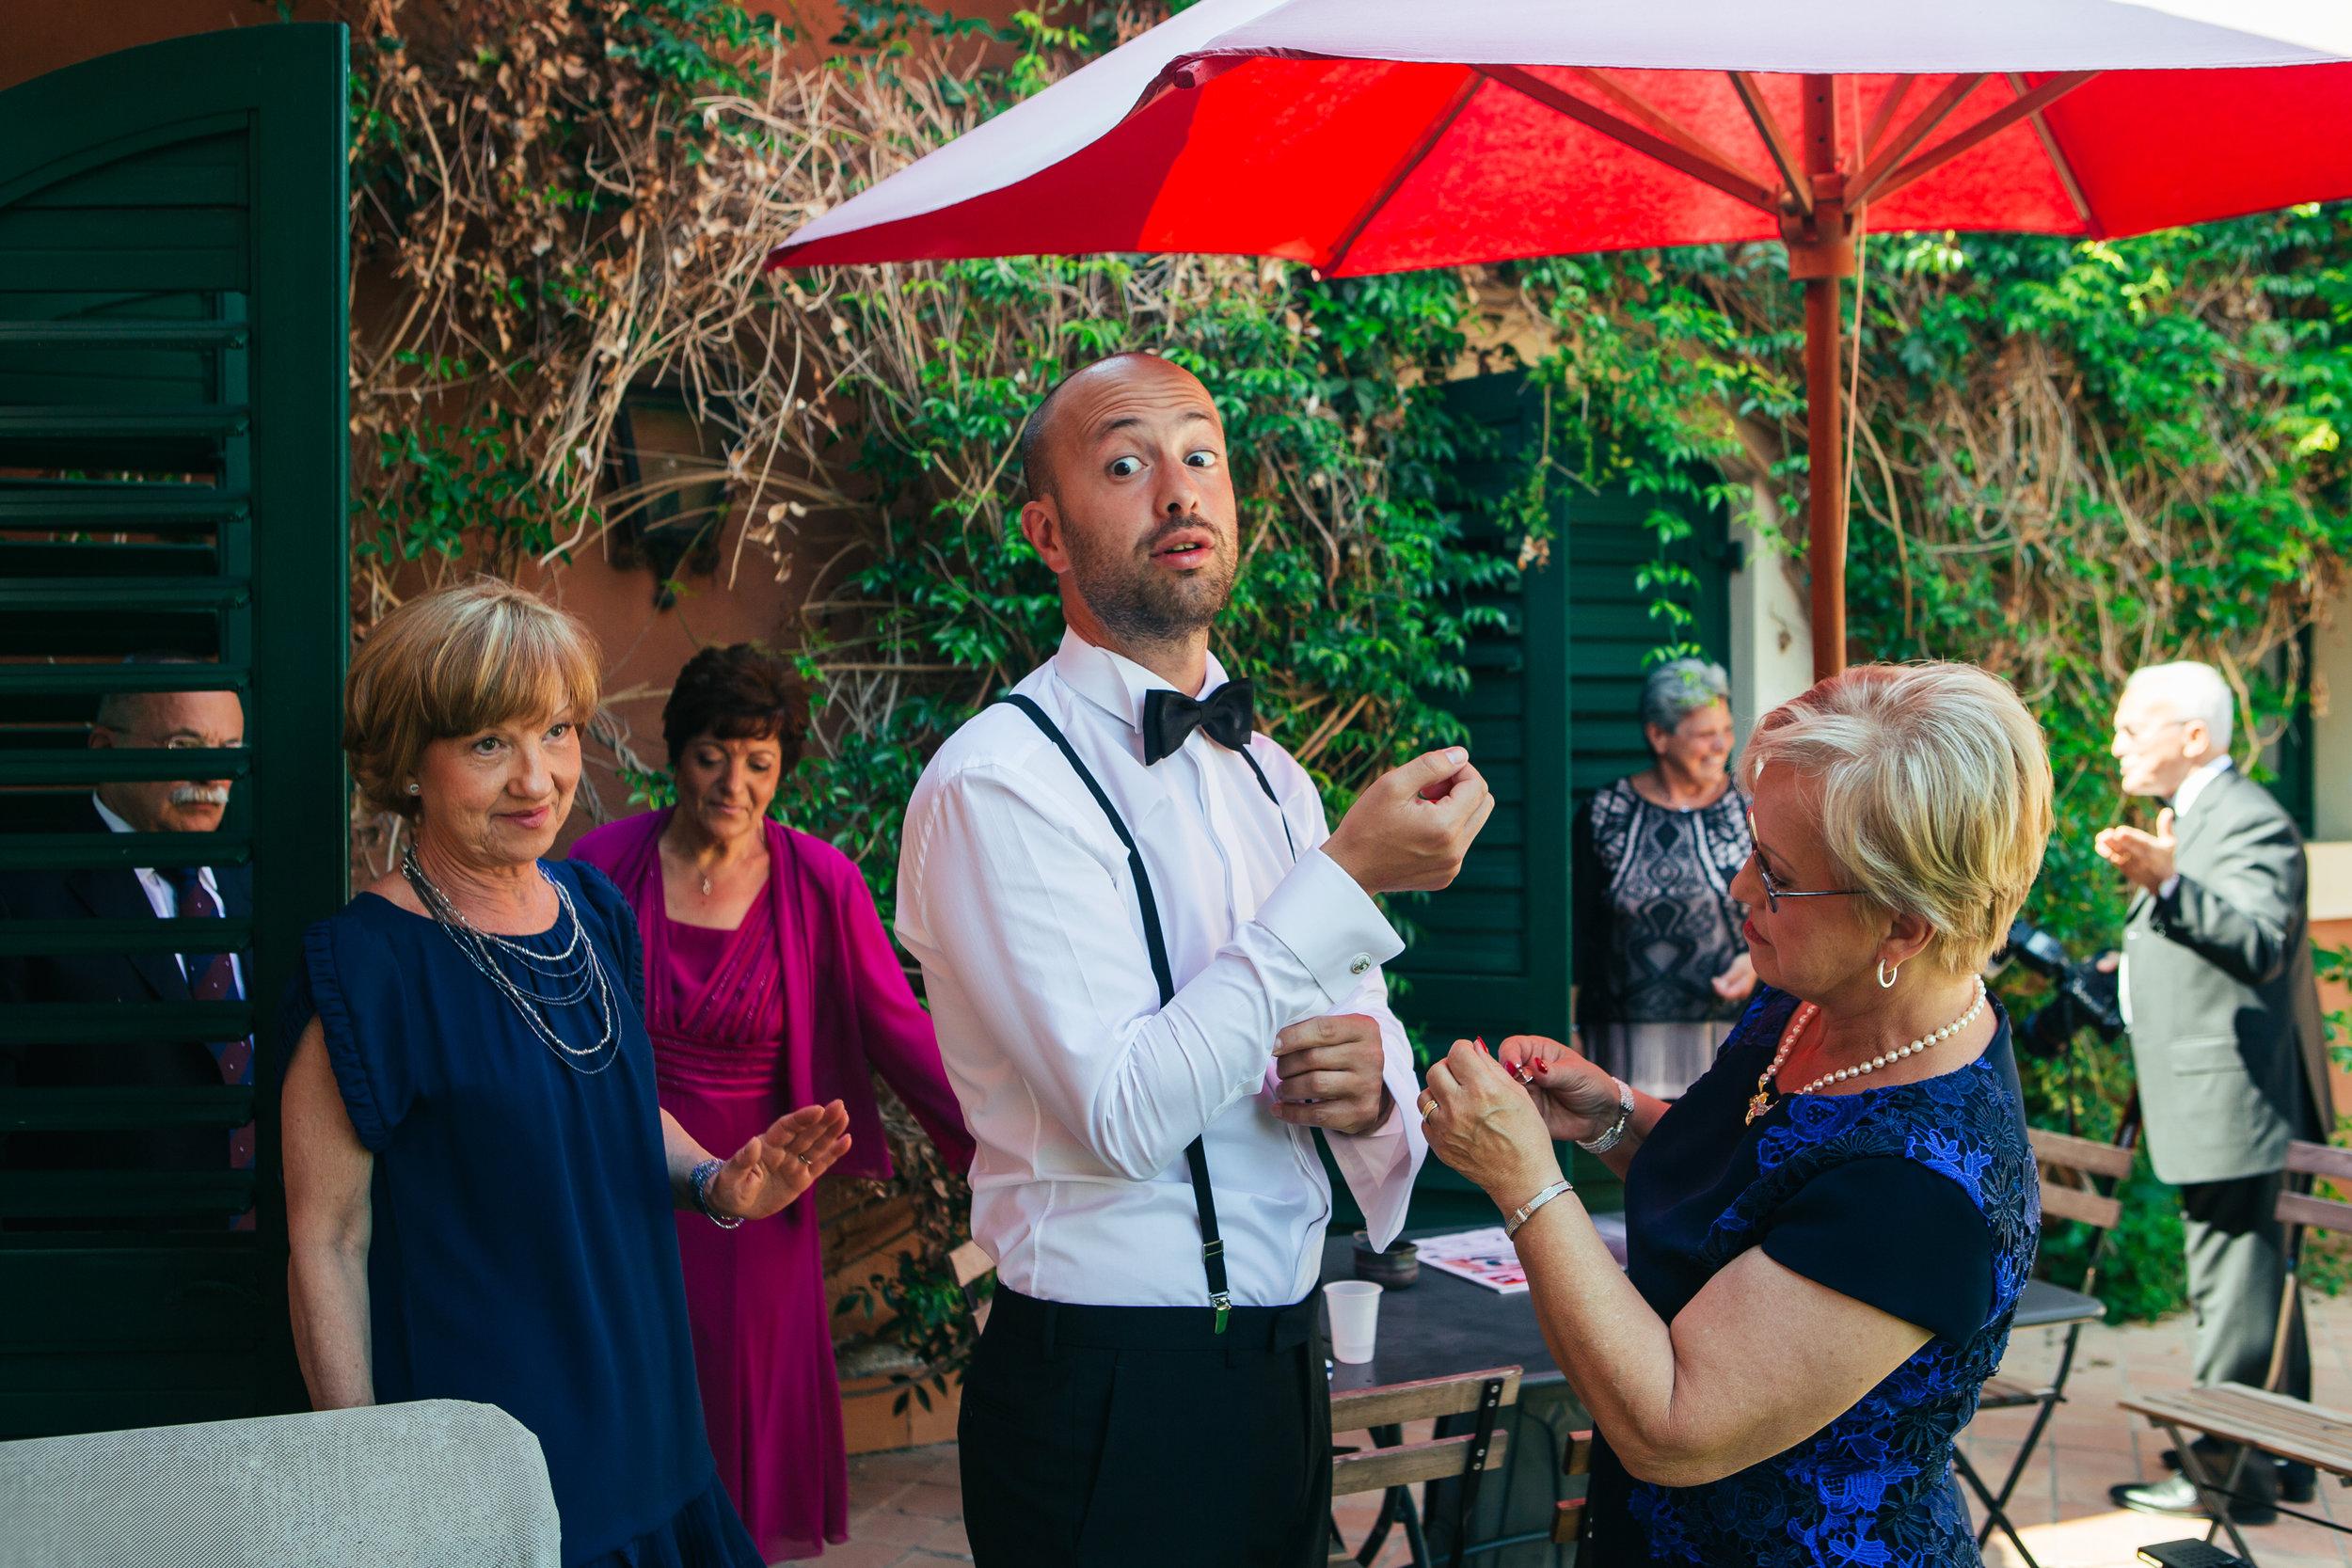 fotografia di matrimonio catania enkant-3.jpg